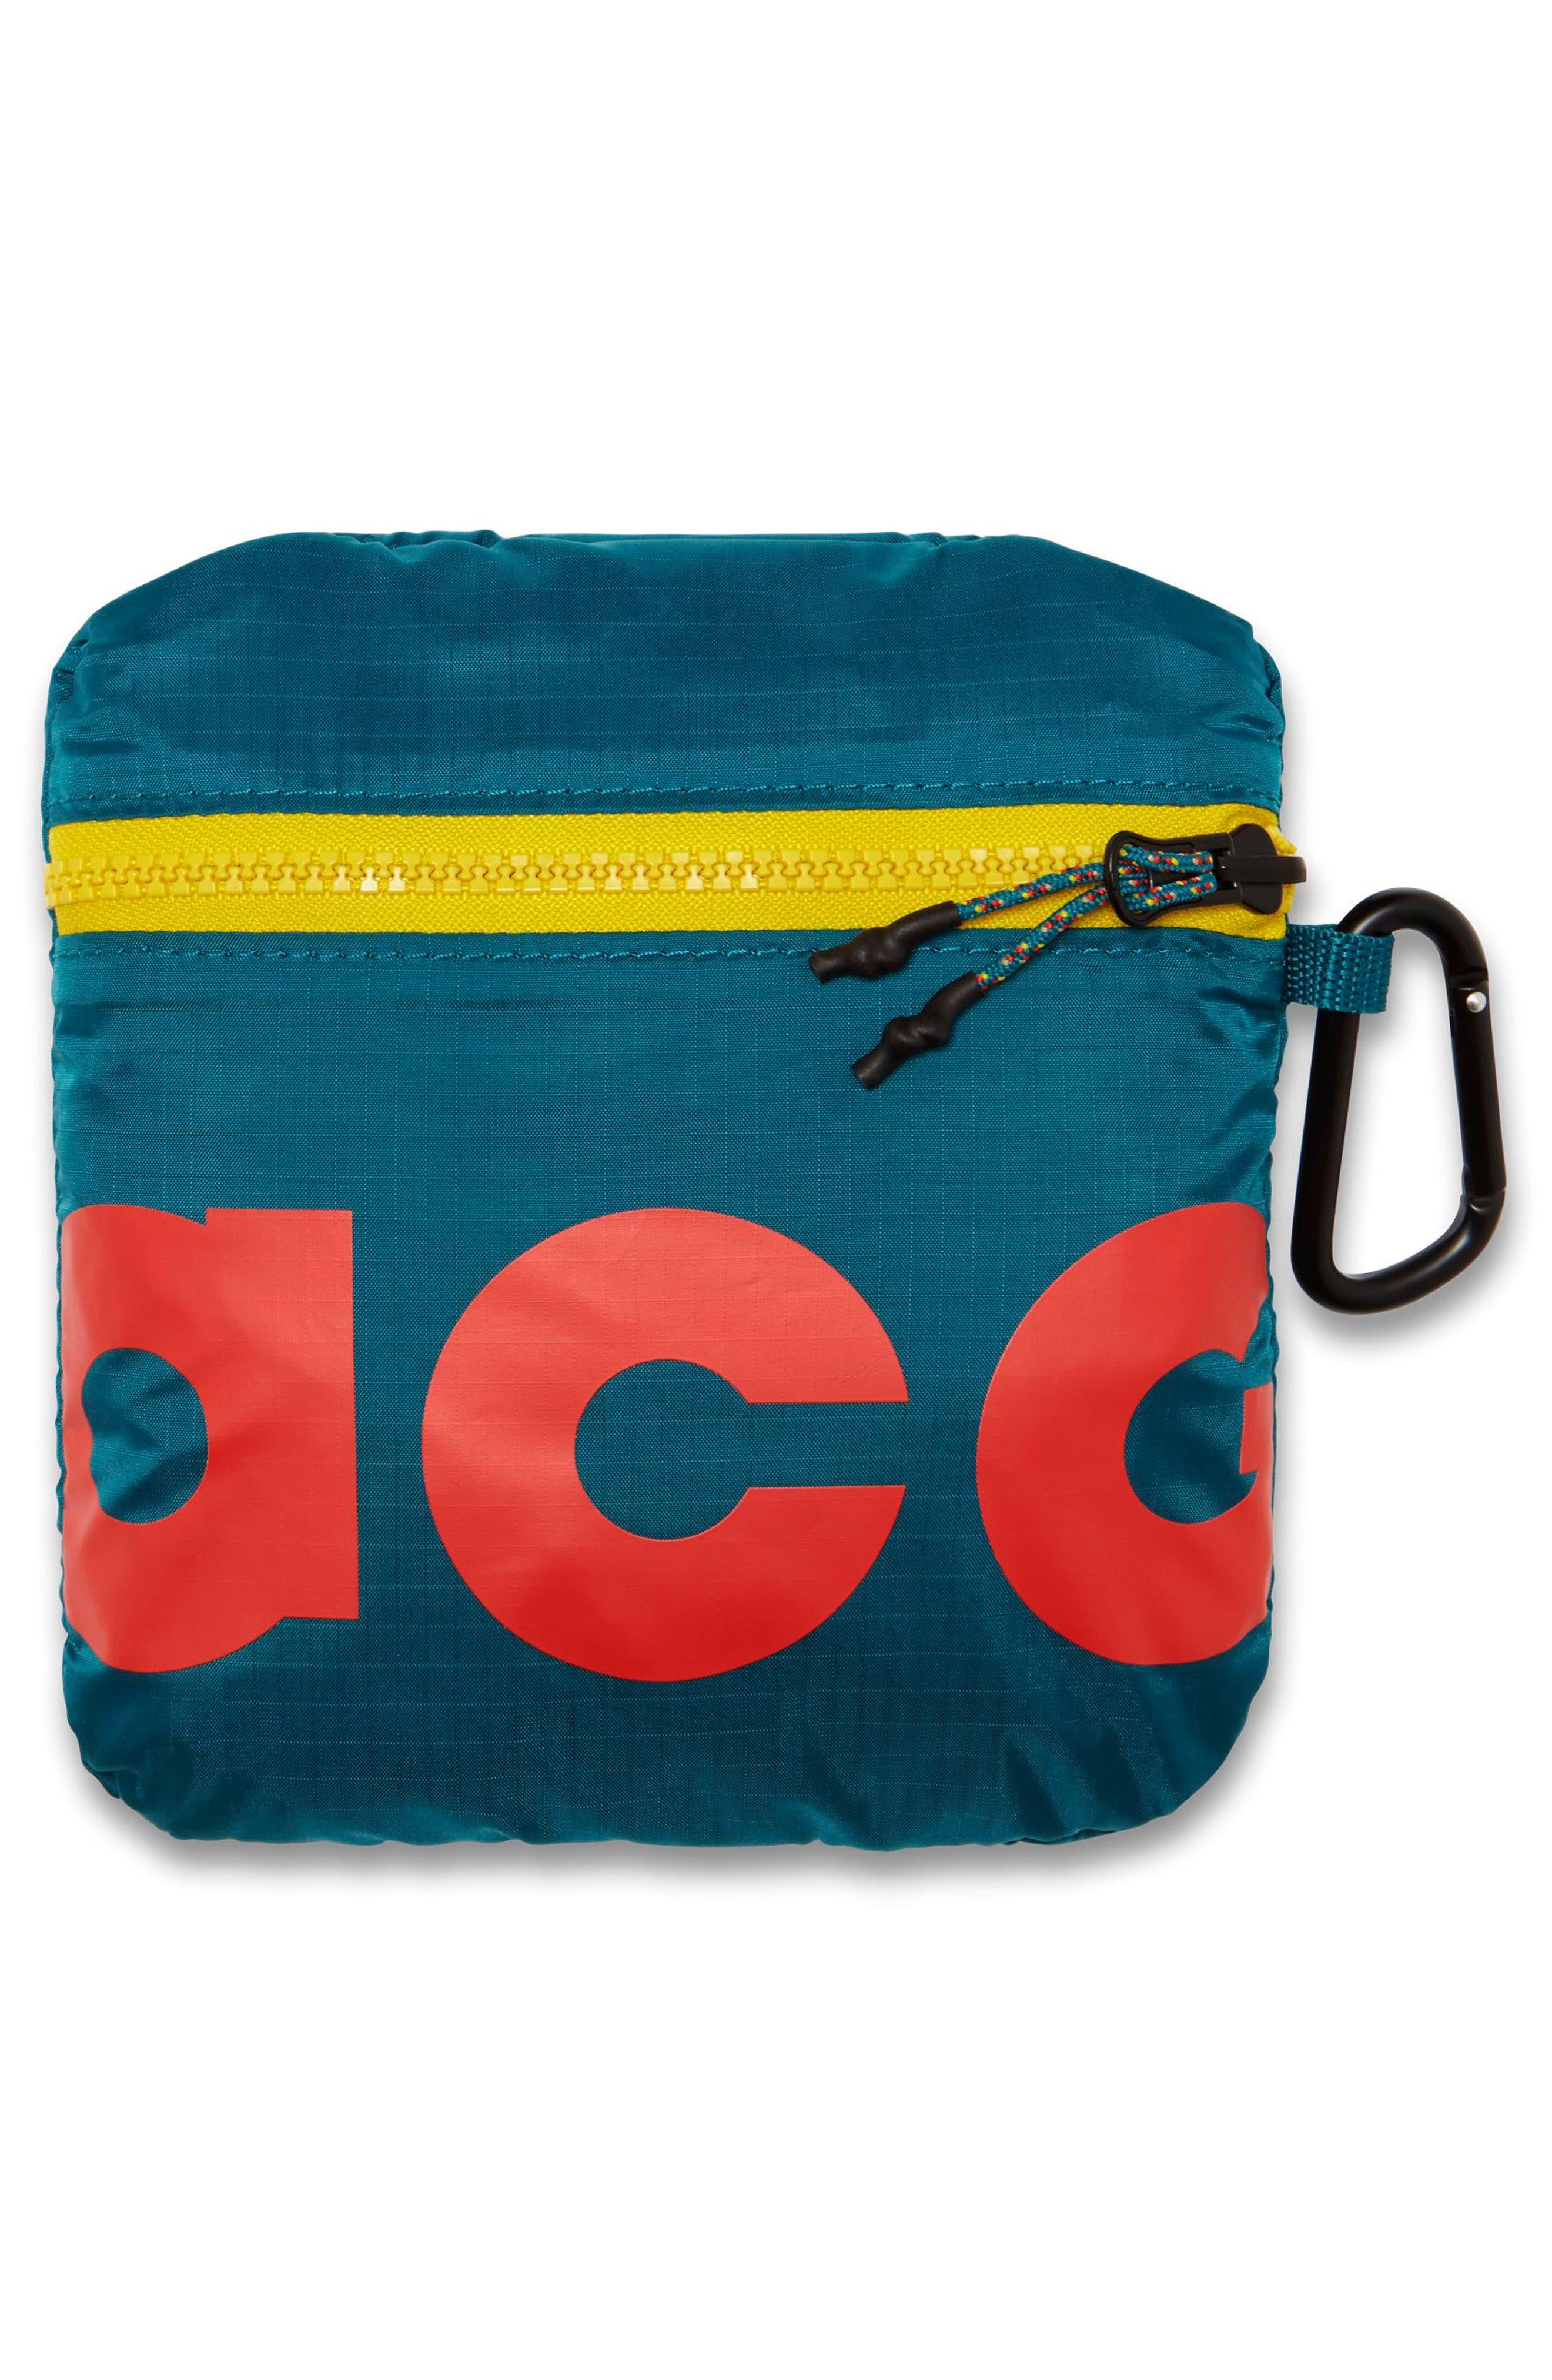 ACG Packable Backpack,                             Alternate thumbnail 5, color,                             GEODE TEAL/ GEODE TEAL